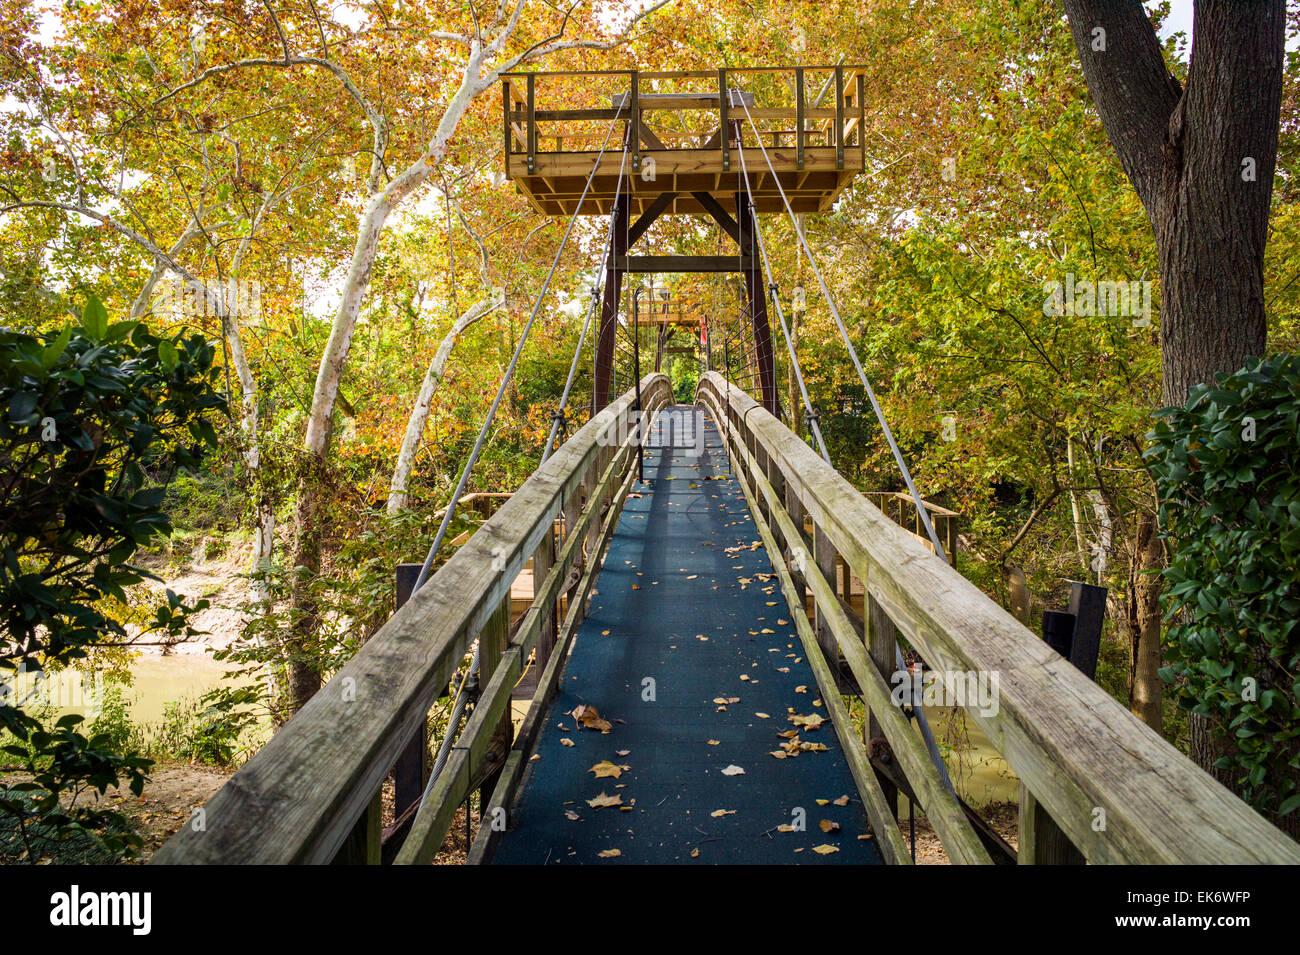 Exceptional Foot Bridge, Bayou Bend Gardens U0026 Home, Museum Of Fine Arts Houston, House